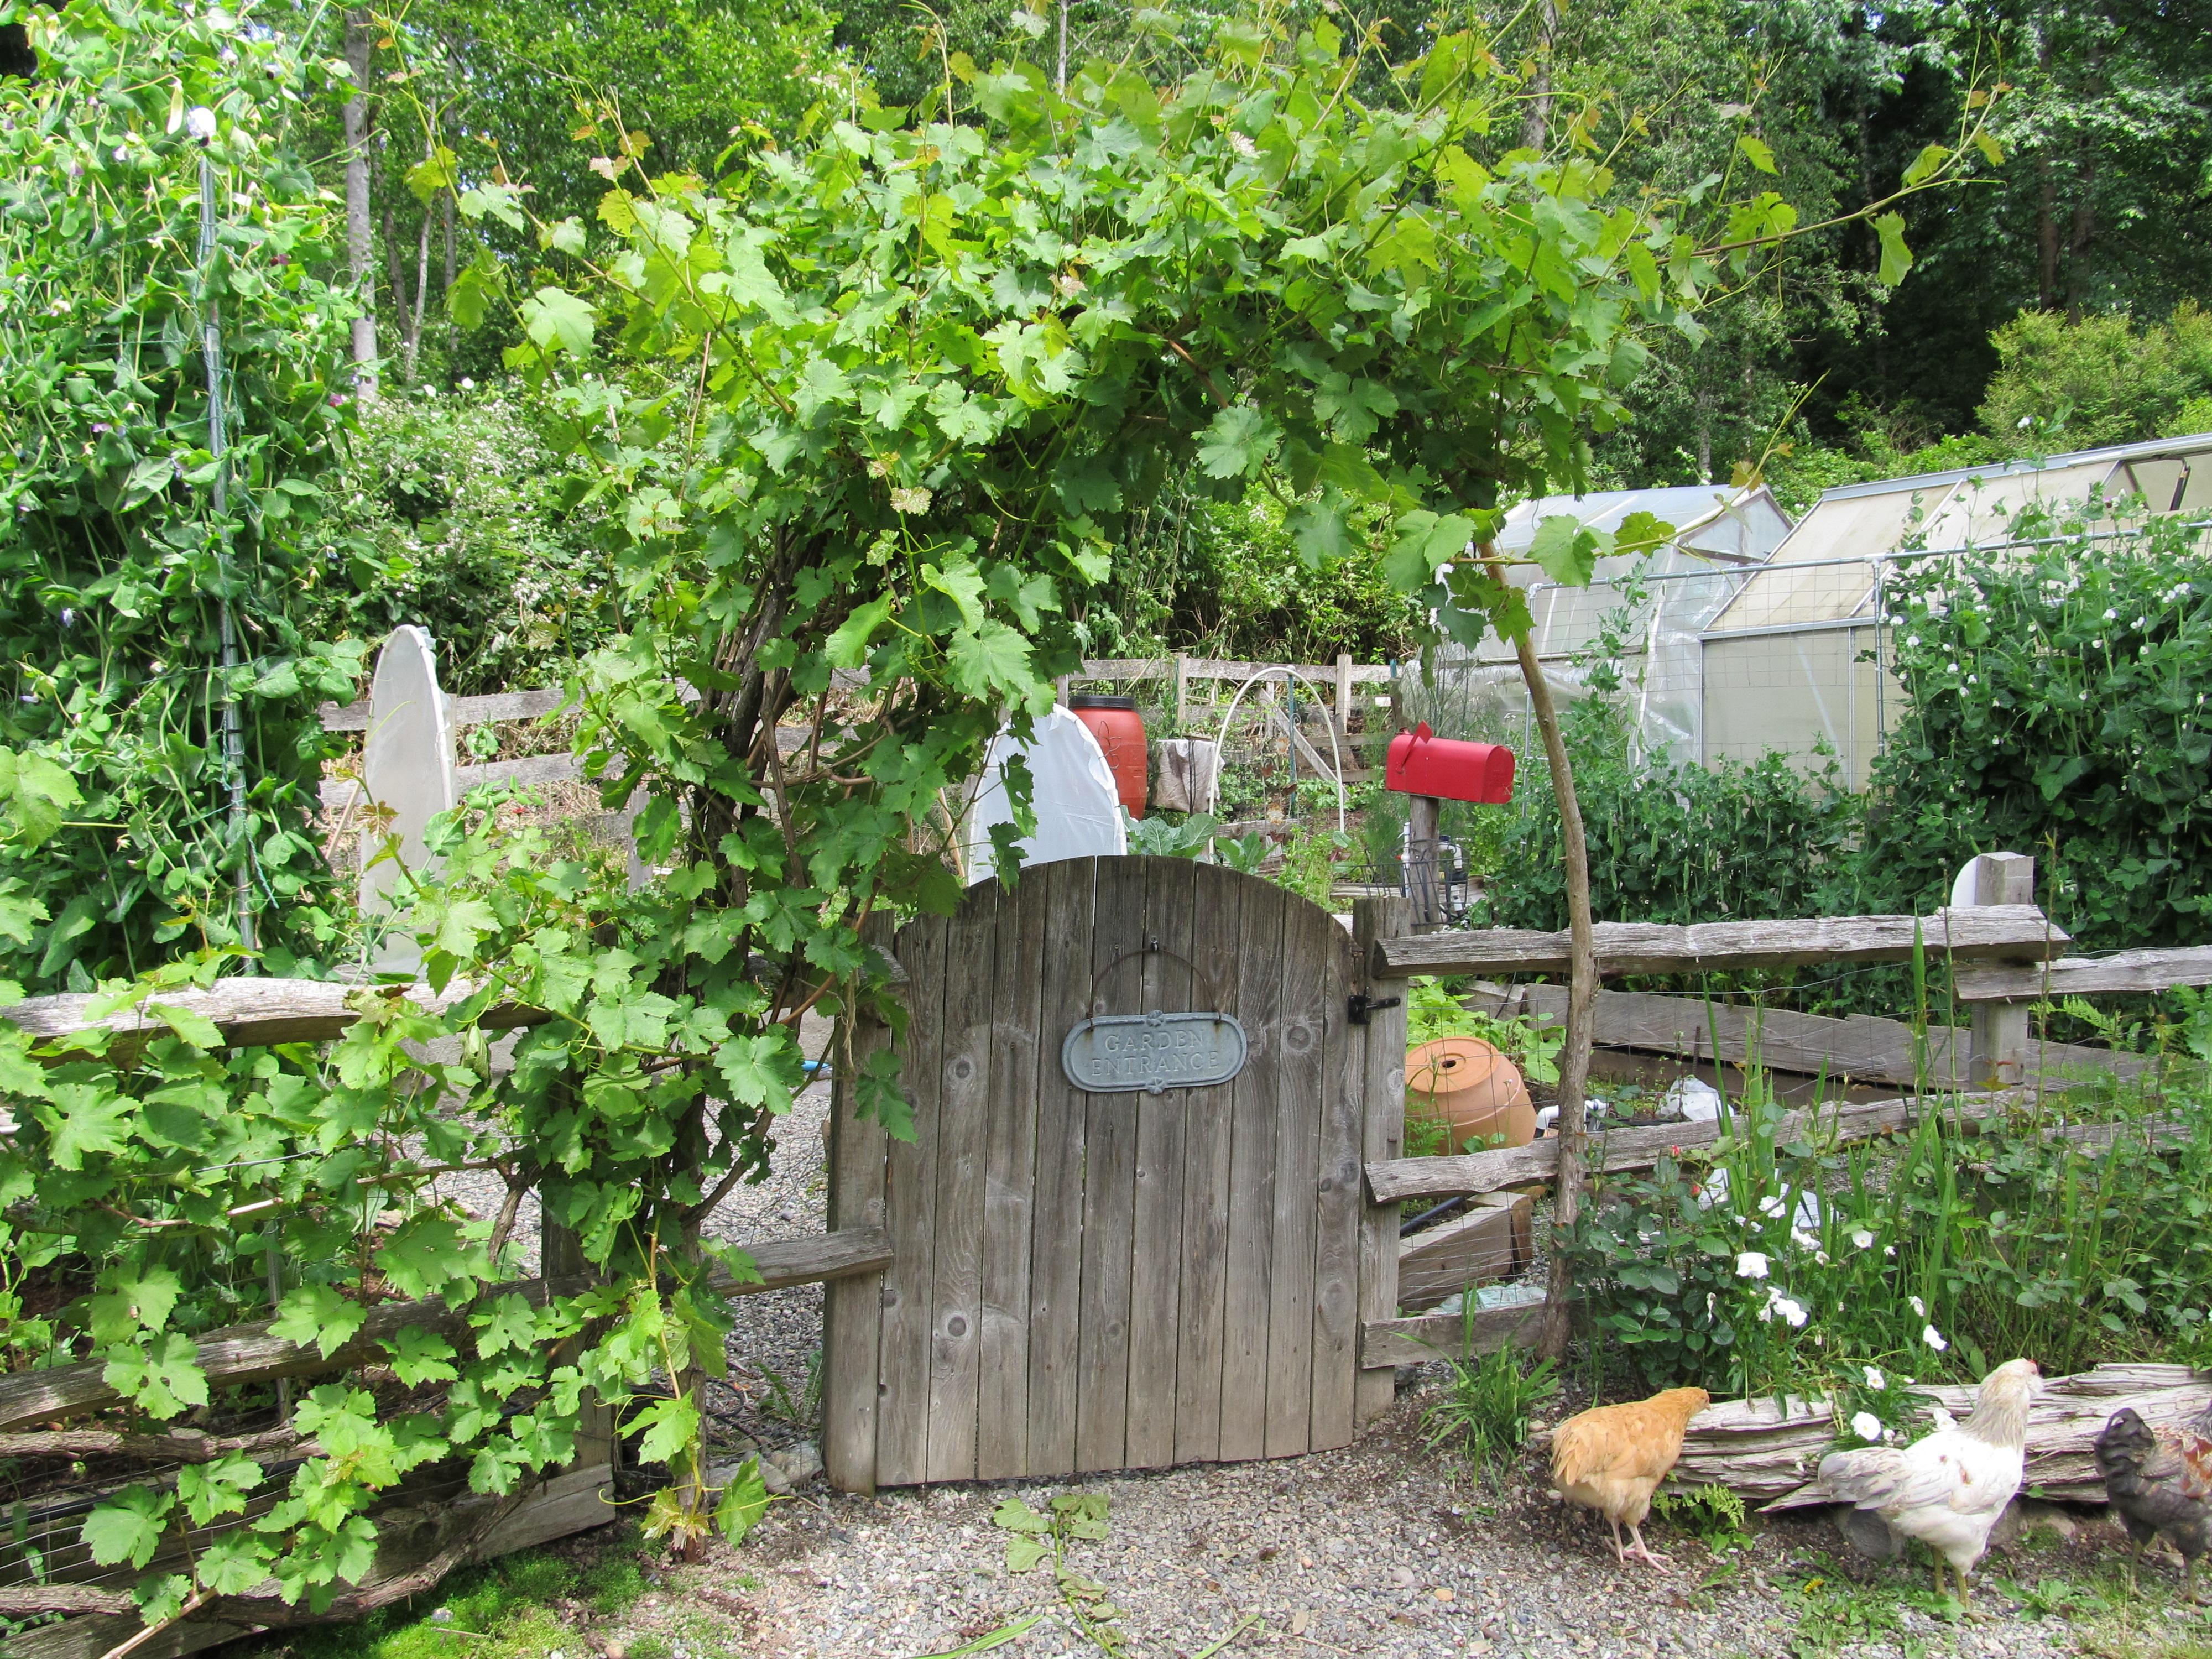 Our Kitchen Garden Robins Garden An Ongoing Photo Tour Throughout The Seasons